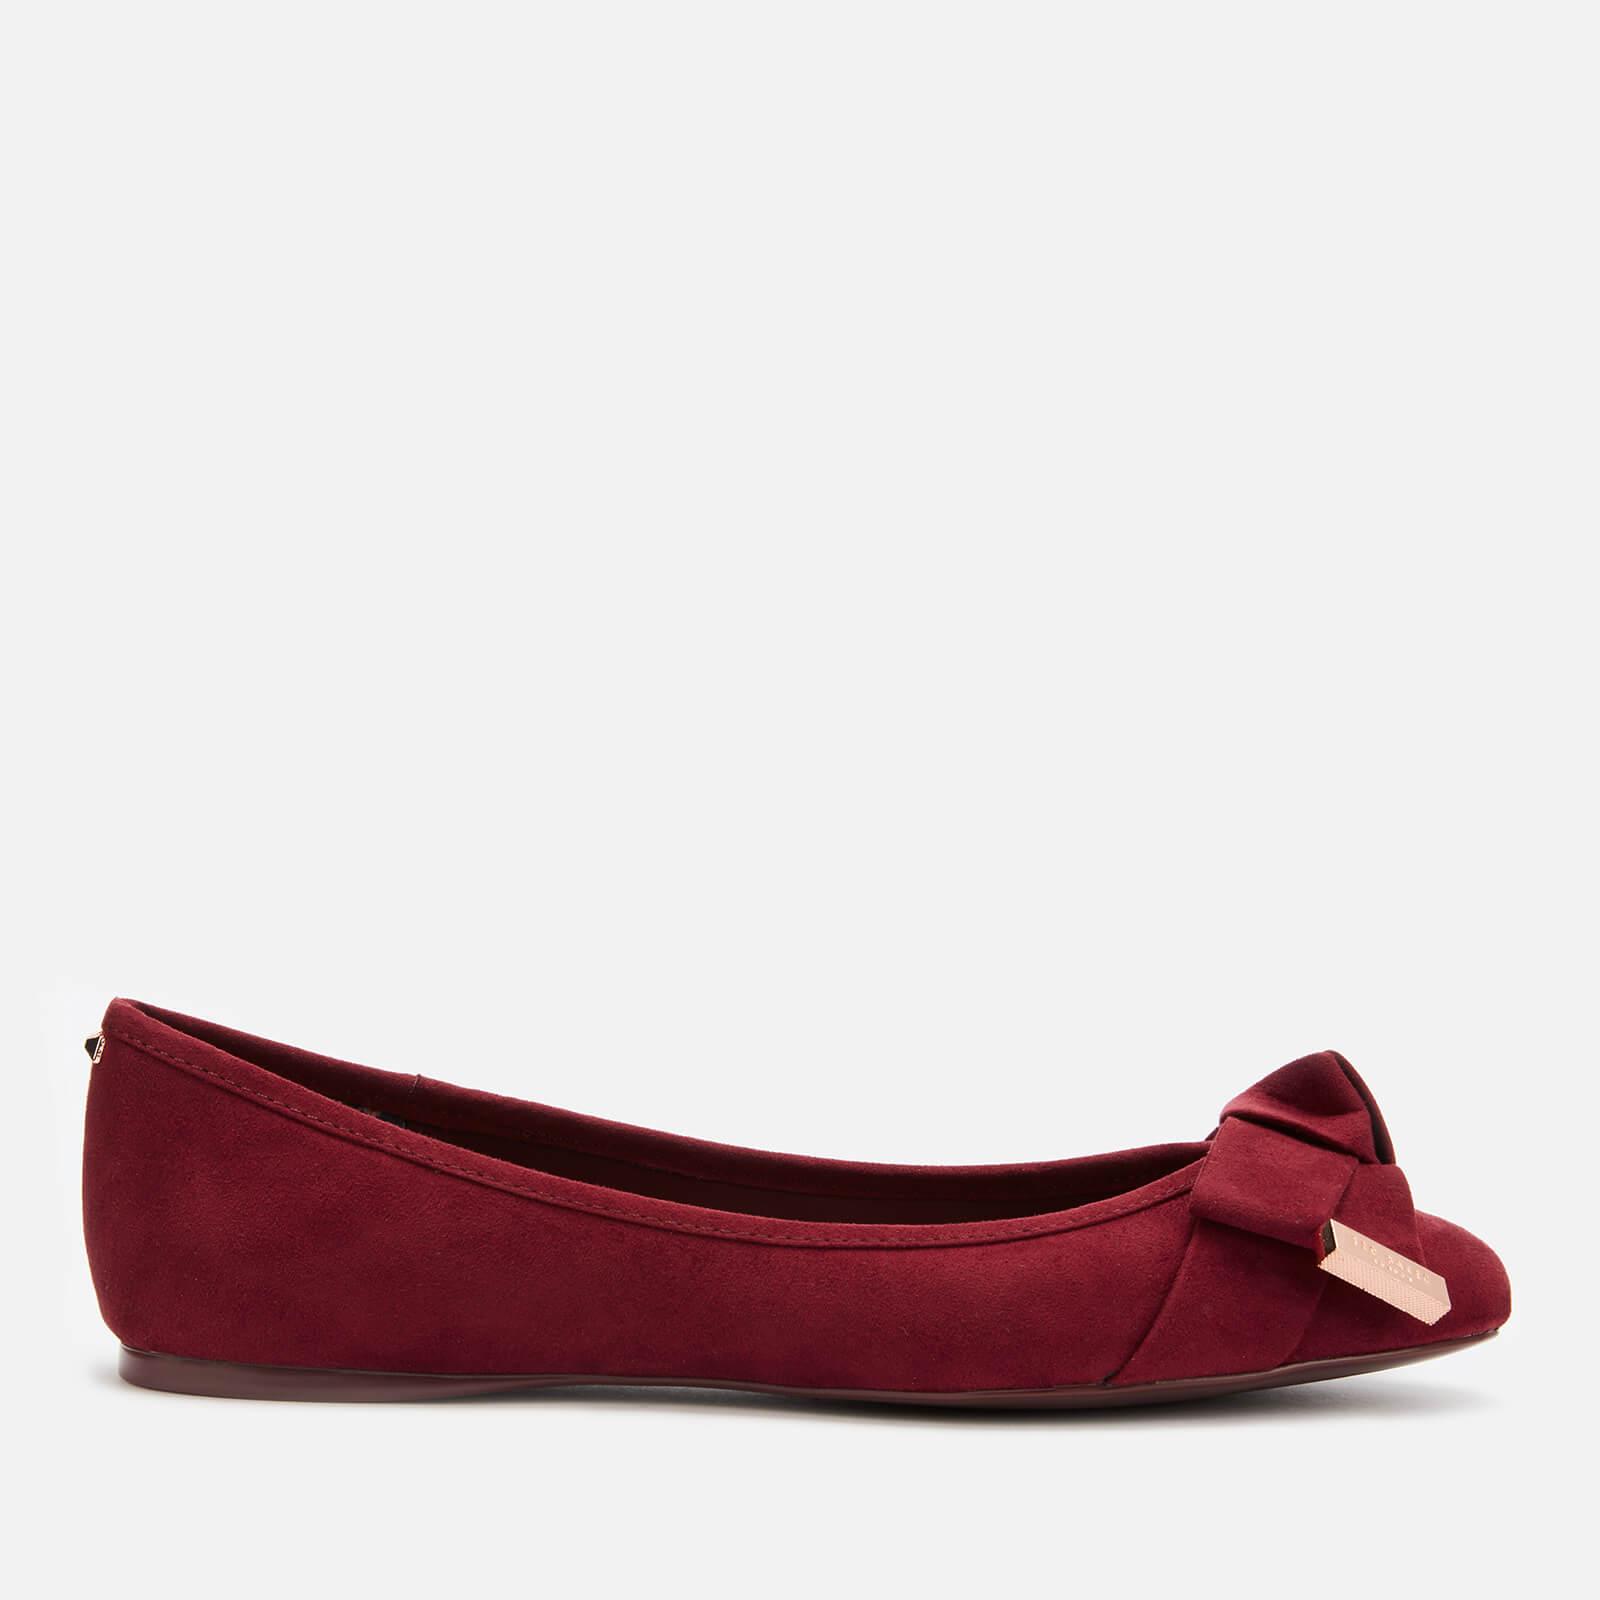 Ted Baker Women's Antheia Ballet Flats - Oxblood - UK 4 - Red